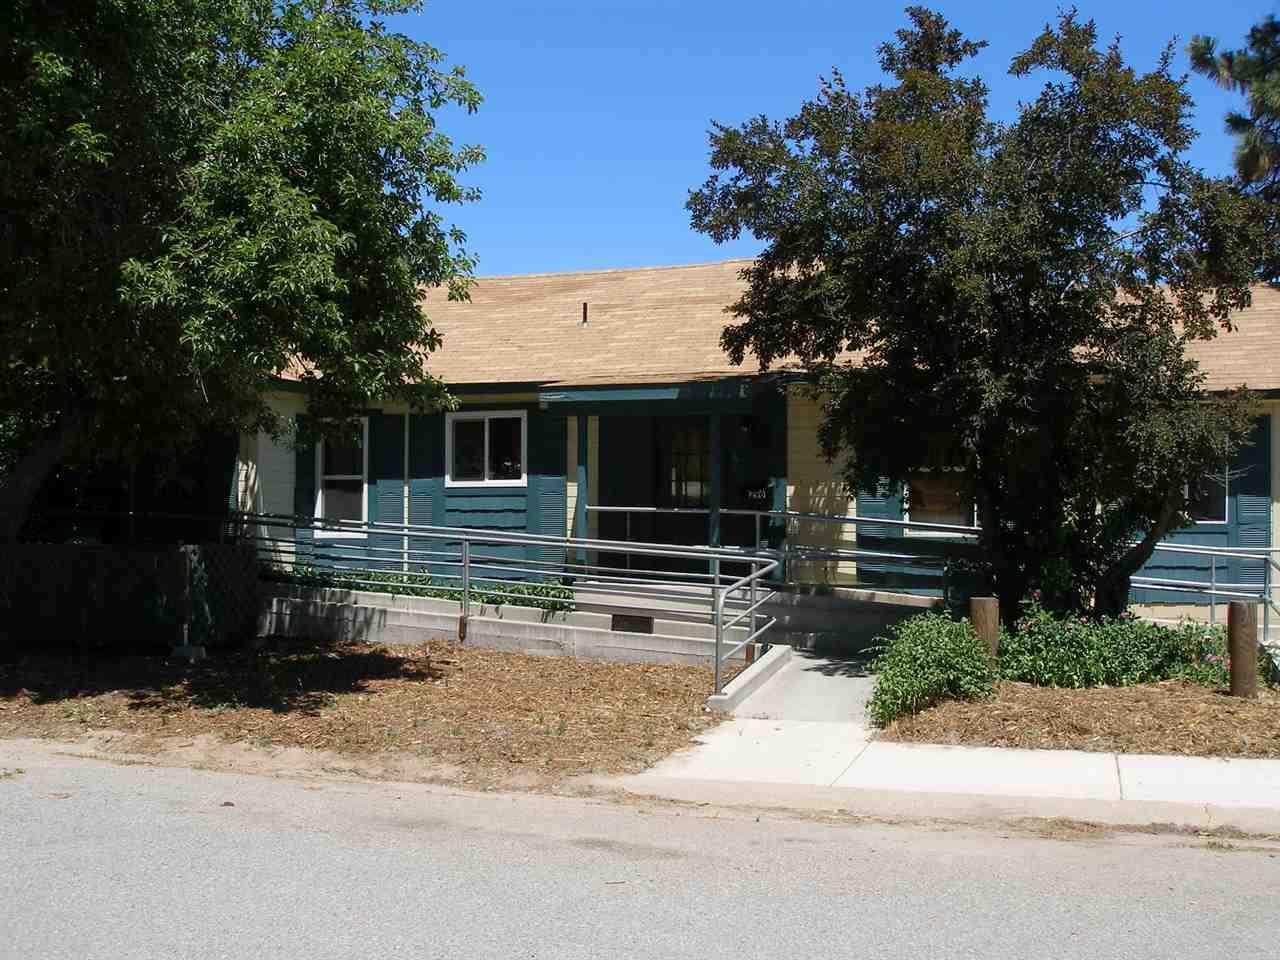 296 W Sierra Avenue, Portola, CA 96122